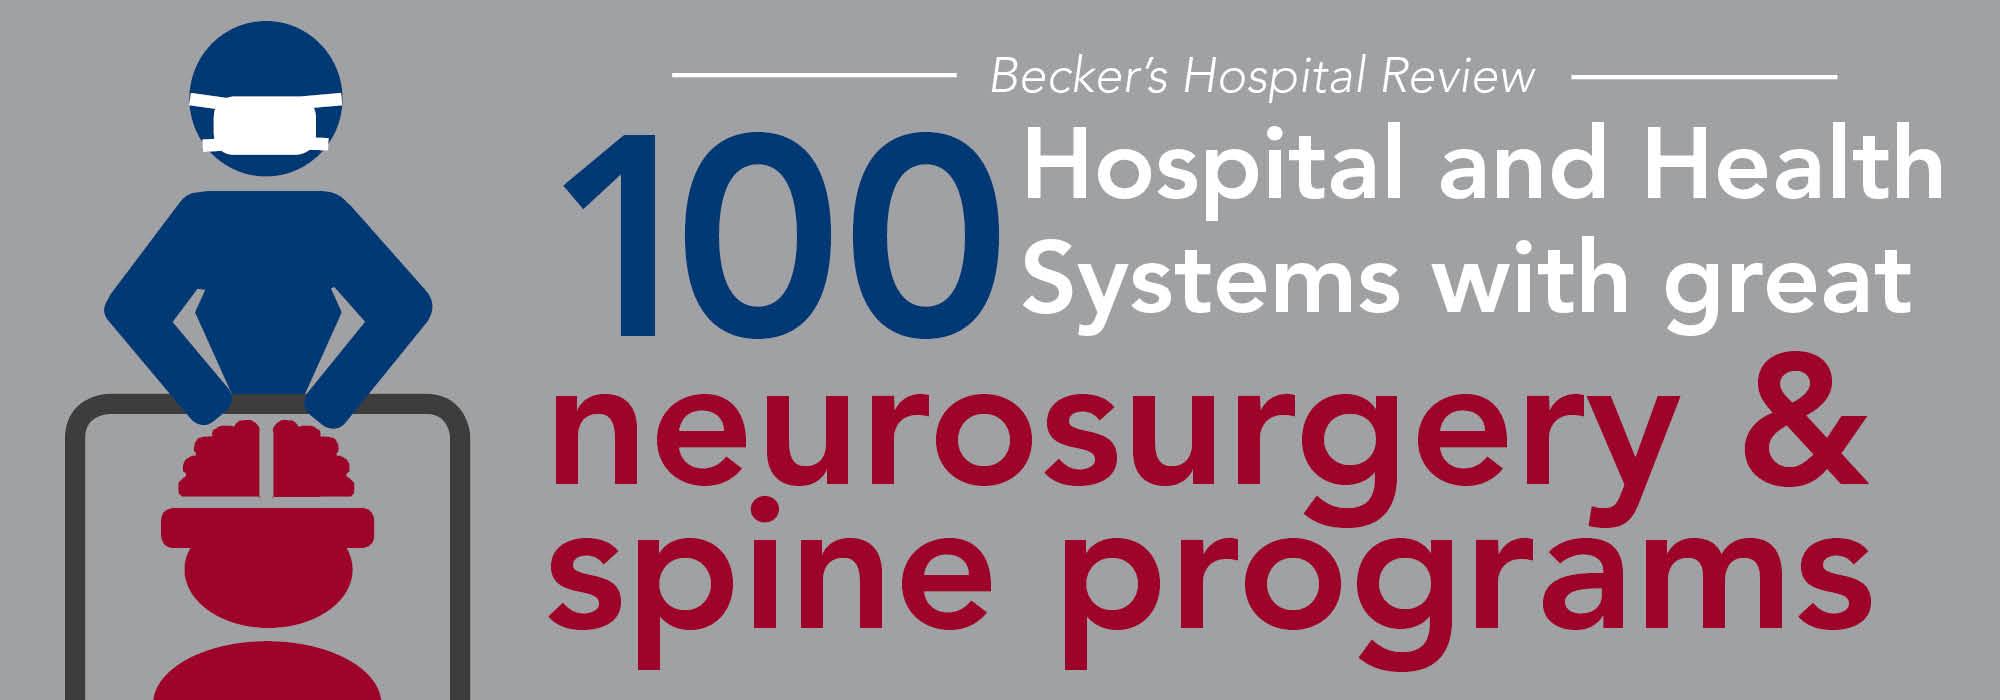 neurosurgery-spine-programs-2015